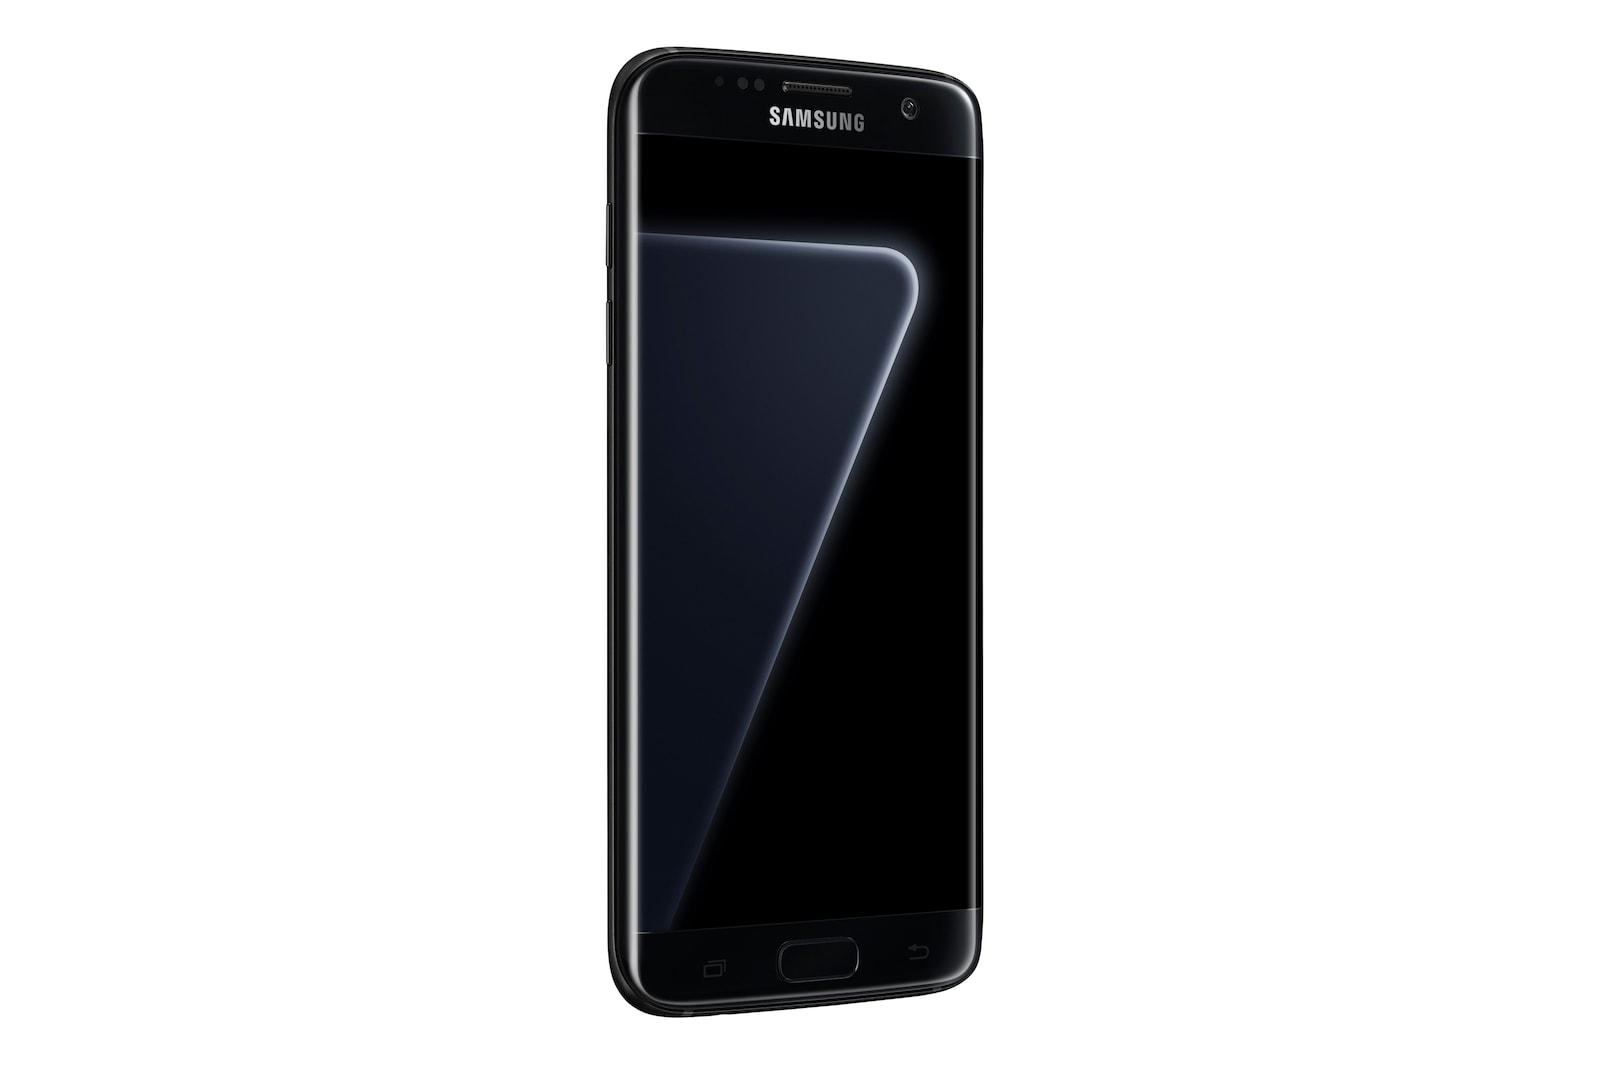 Celular Samsung Galaxy S7 Edge Color Black Pearl (Telcel)